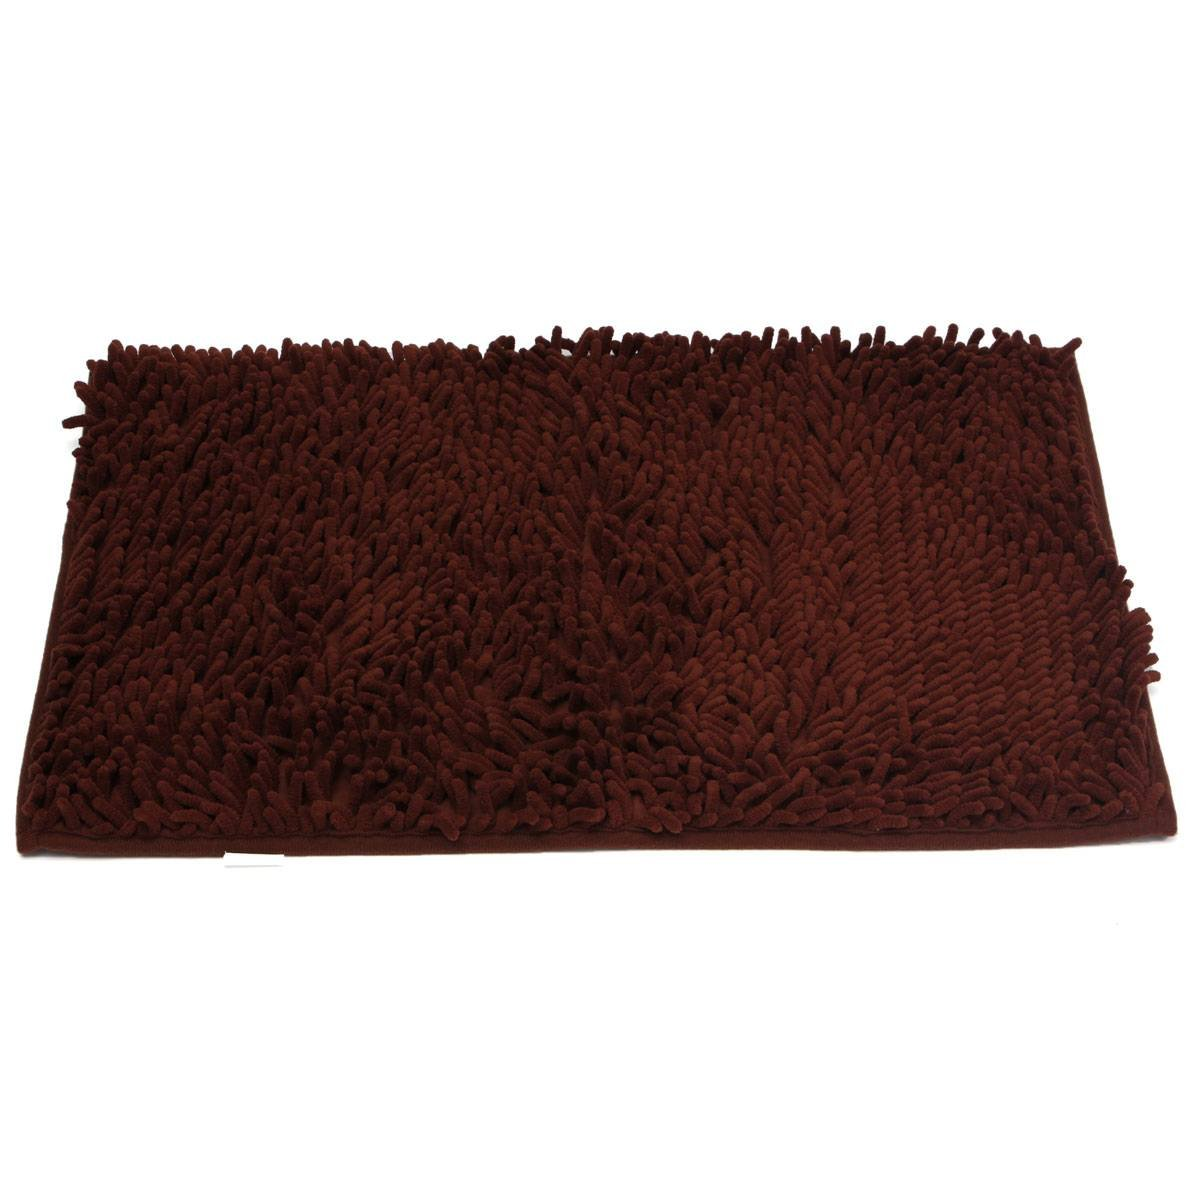 Washable Bathroom Carpet: 1pcs Washable Bathroom New Shaggy Rugs Non Slip Bath Mat